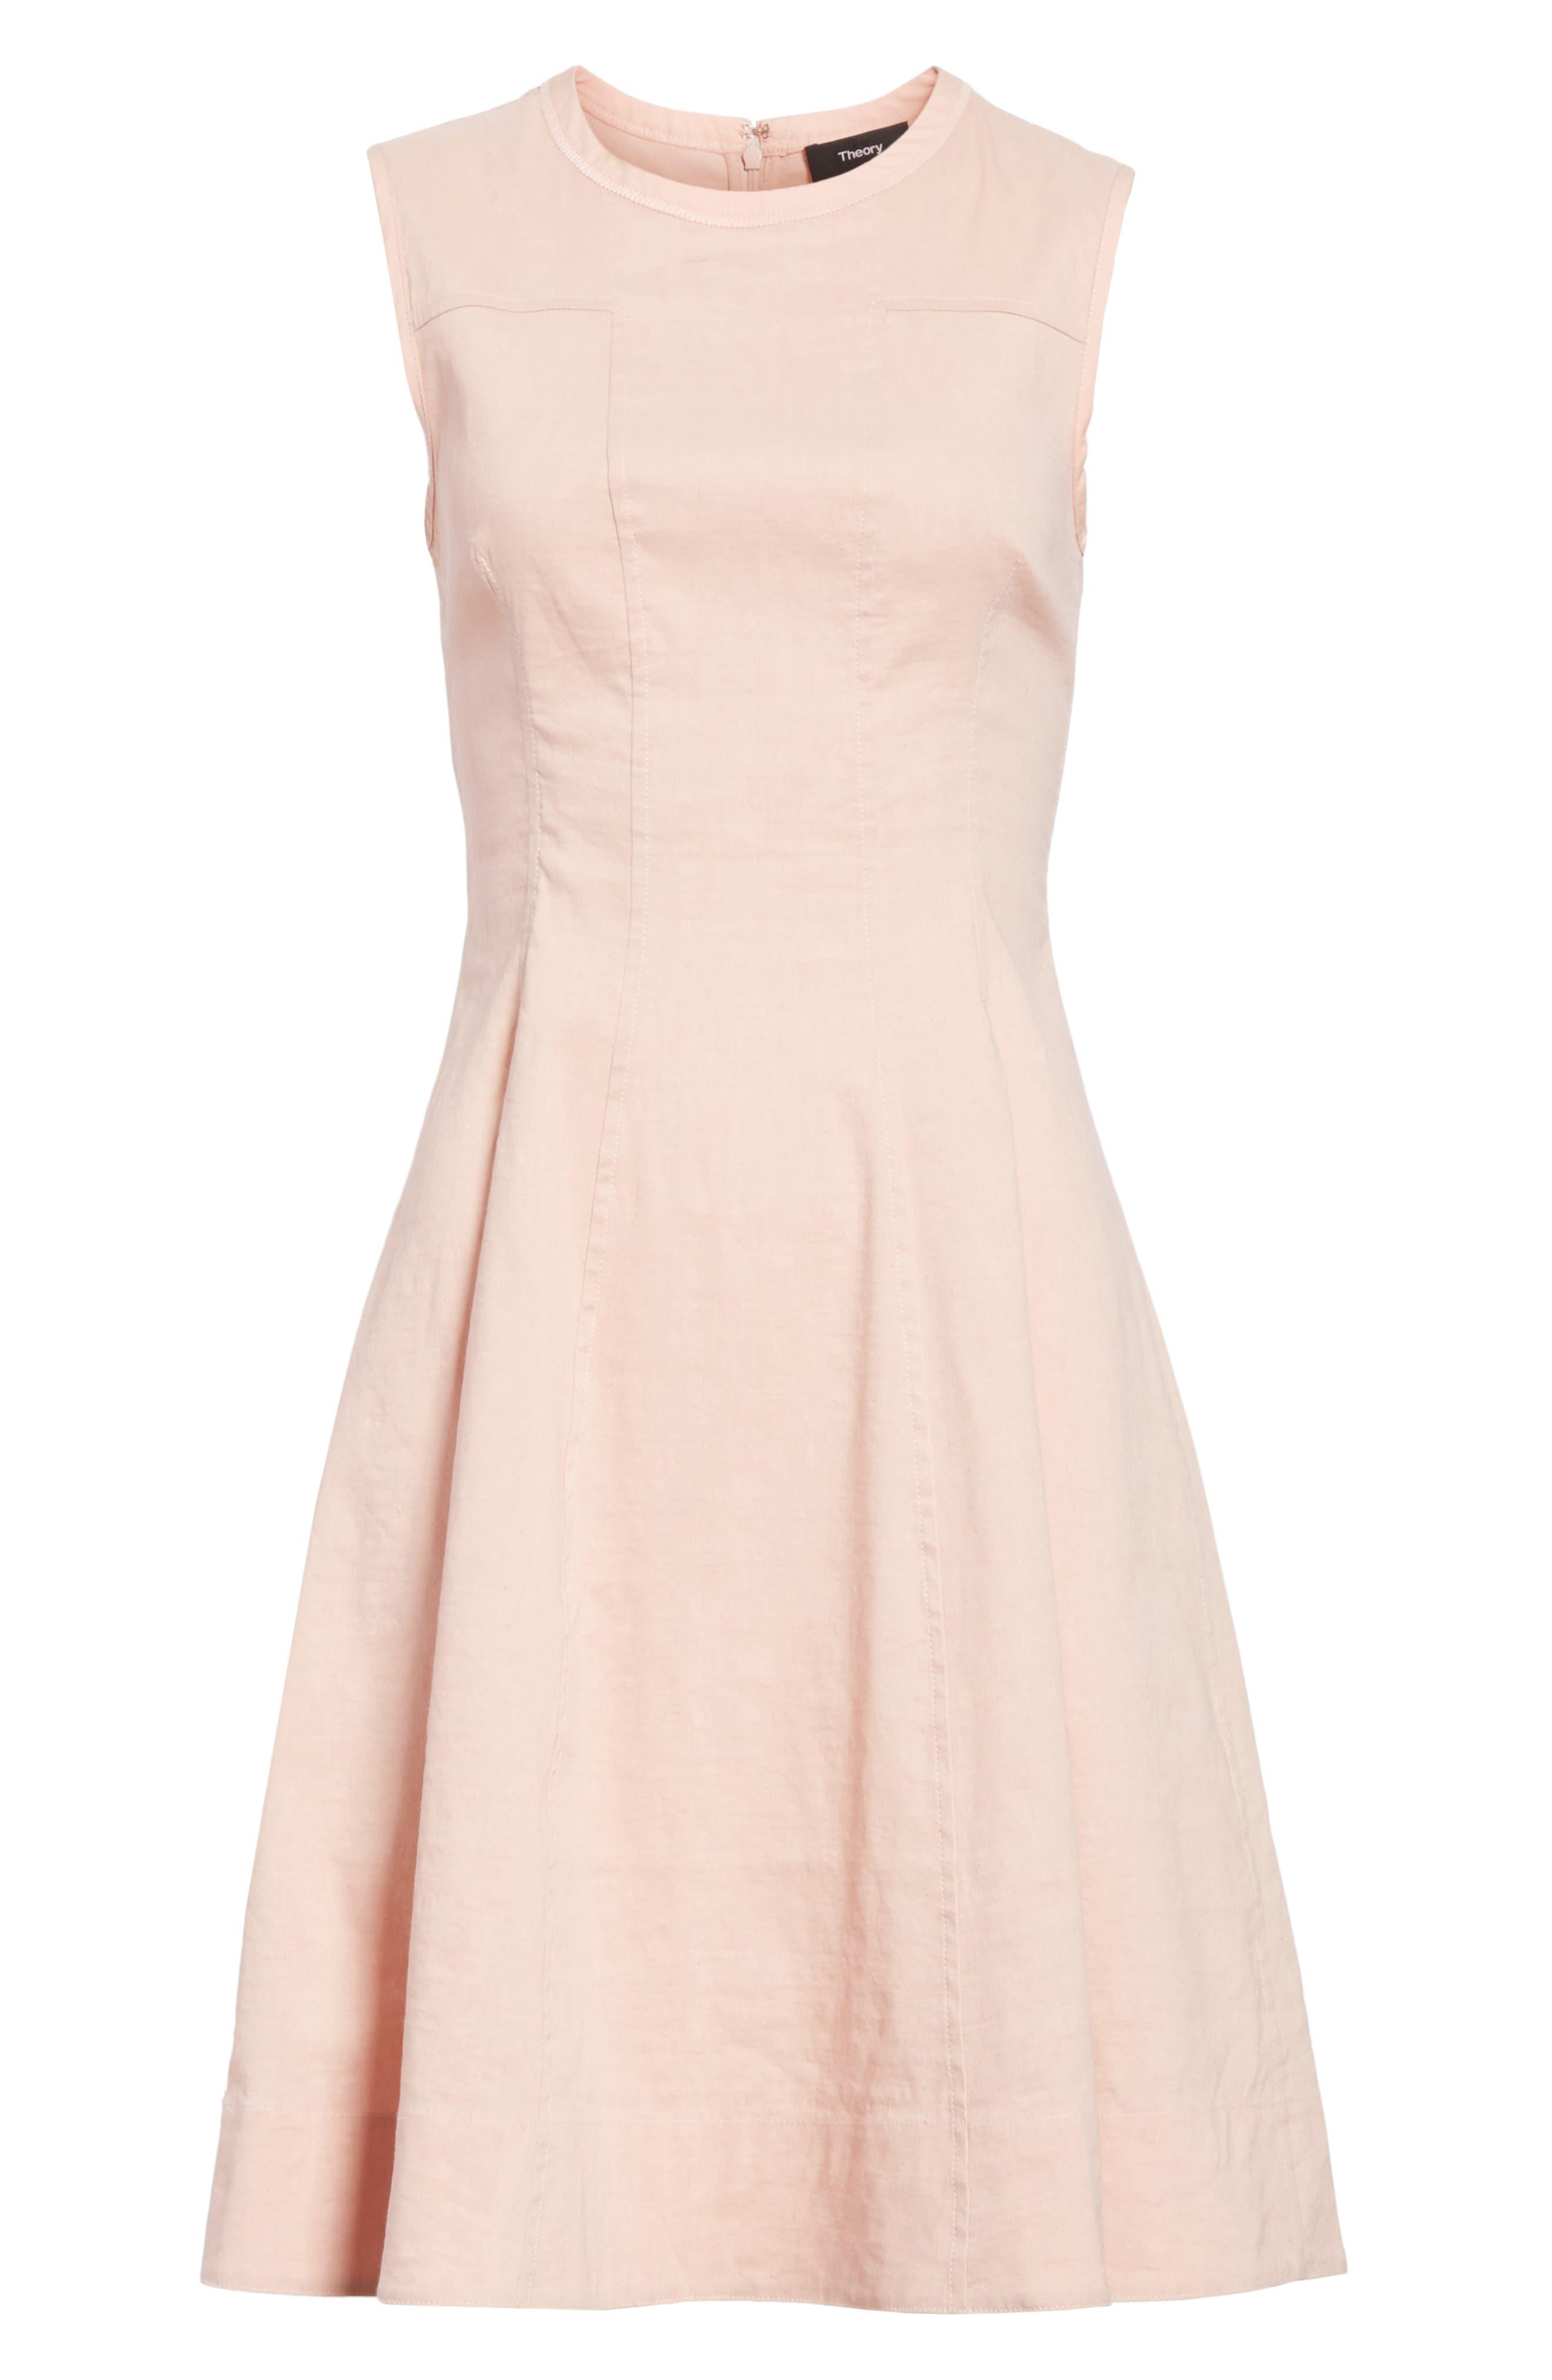 Modern Tea Dress,                             Alternate thumbnail 6, color,                             Pink Ballet